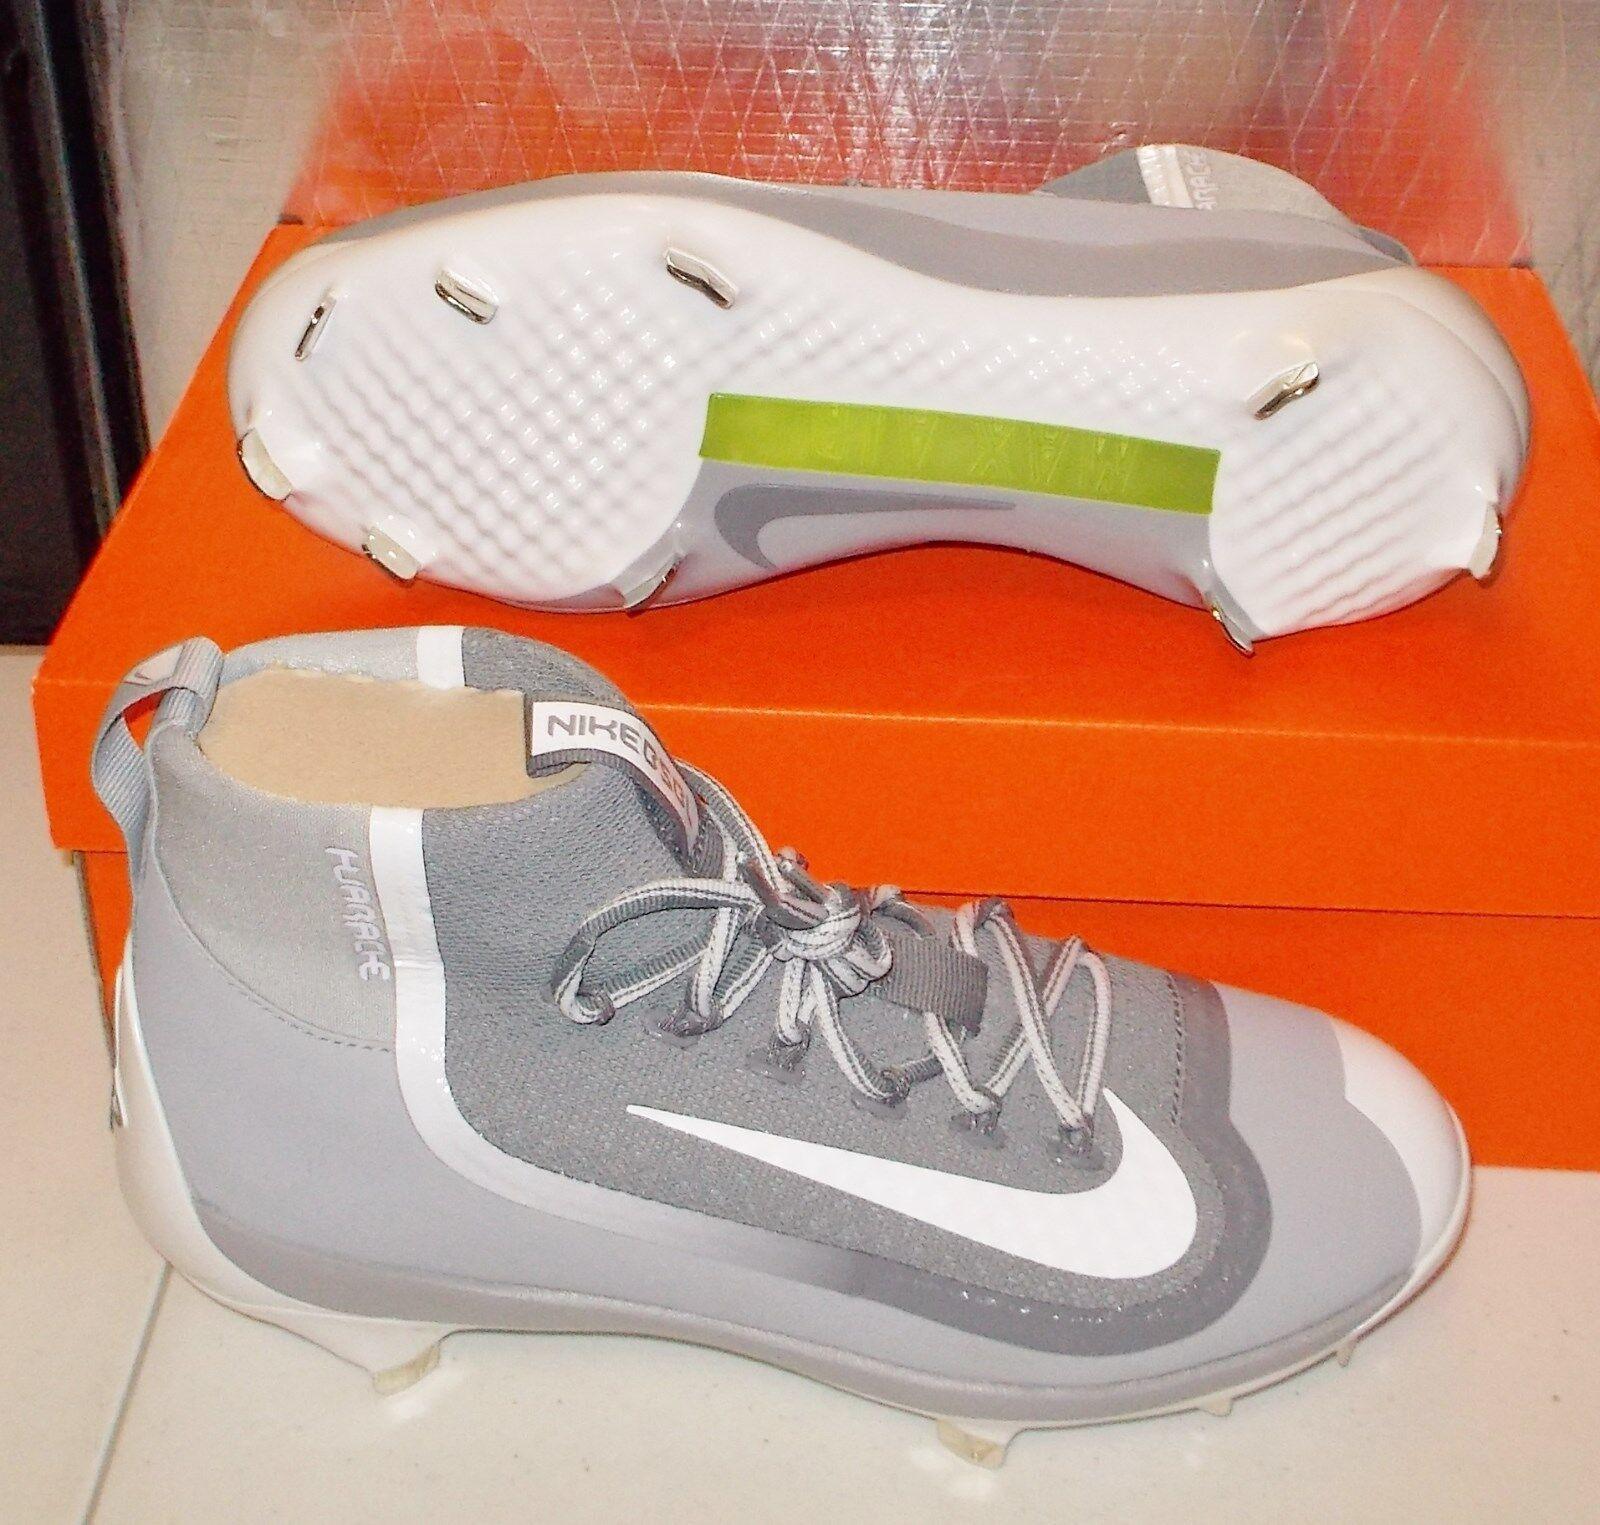 Nike Air huarache 2K 749359 mugre Elite Mid hombre 749359 2K 011 nuevo metal Baseball cleats fa61f0